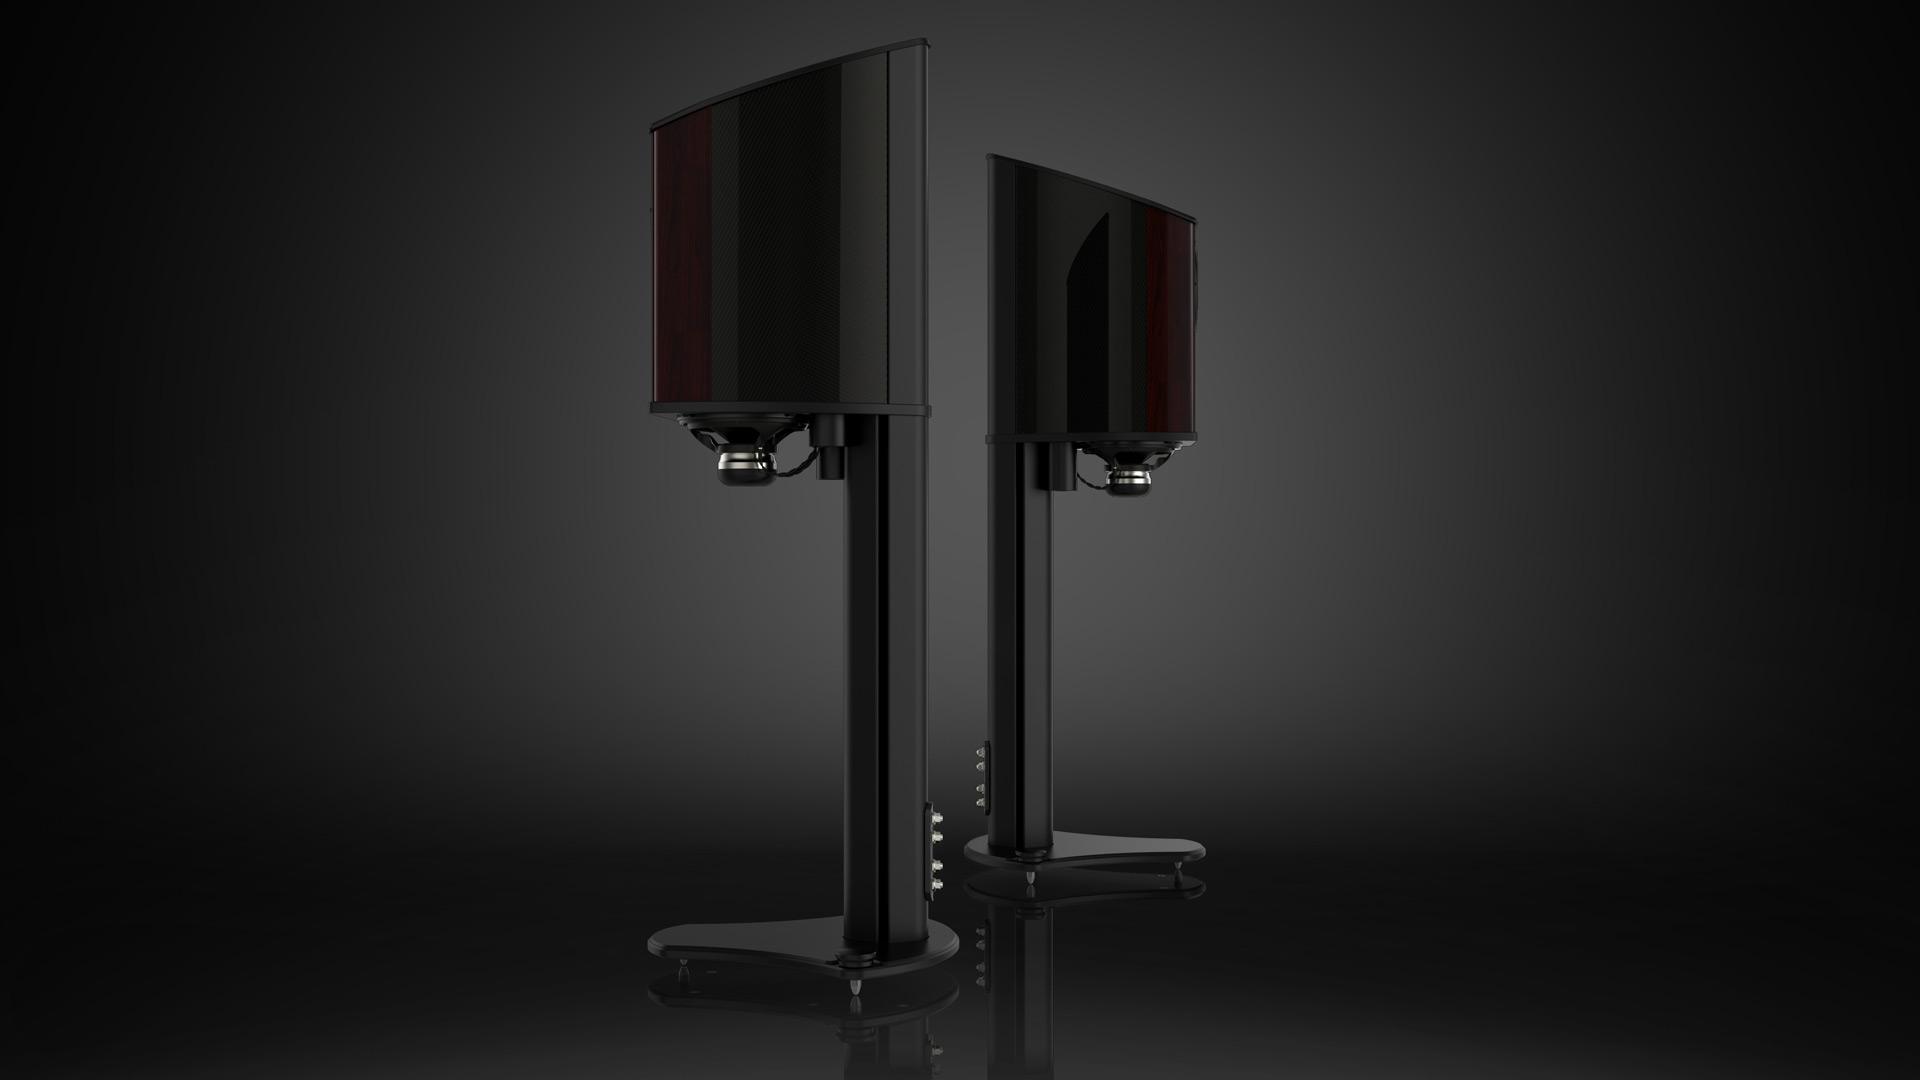 Wilson-Benesch-Geometry-Series-discovery-2-standmount-loudspeaker-singularity-audio-1